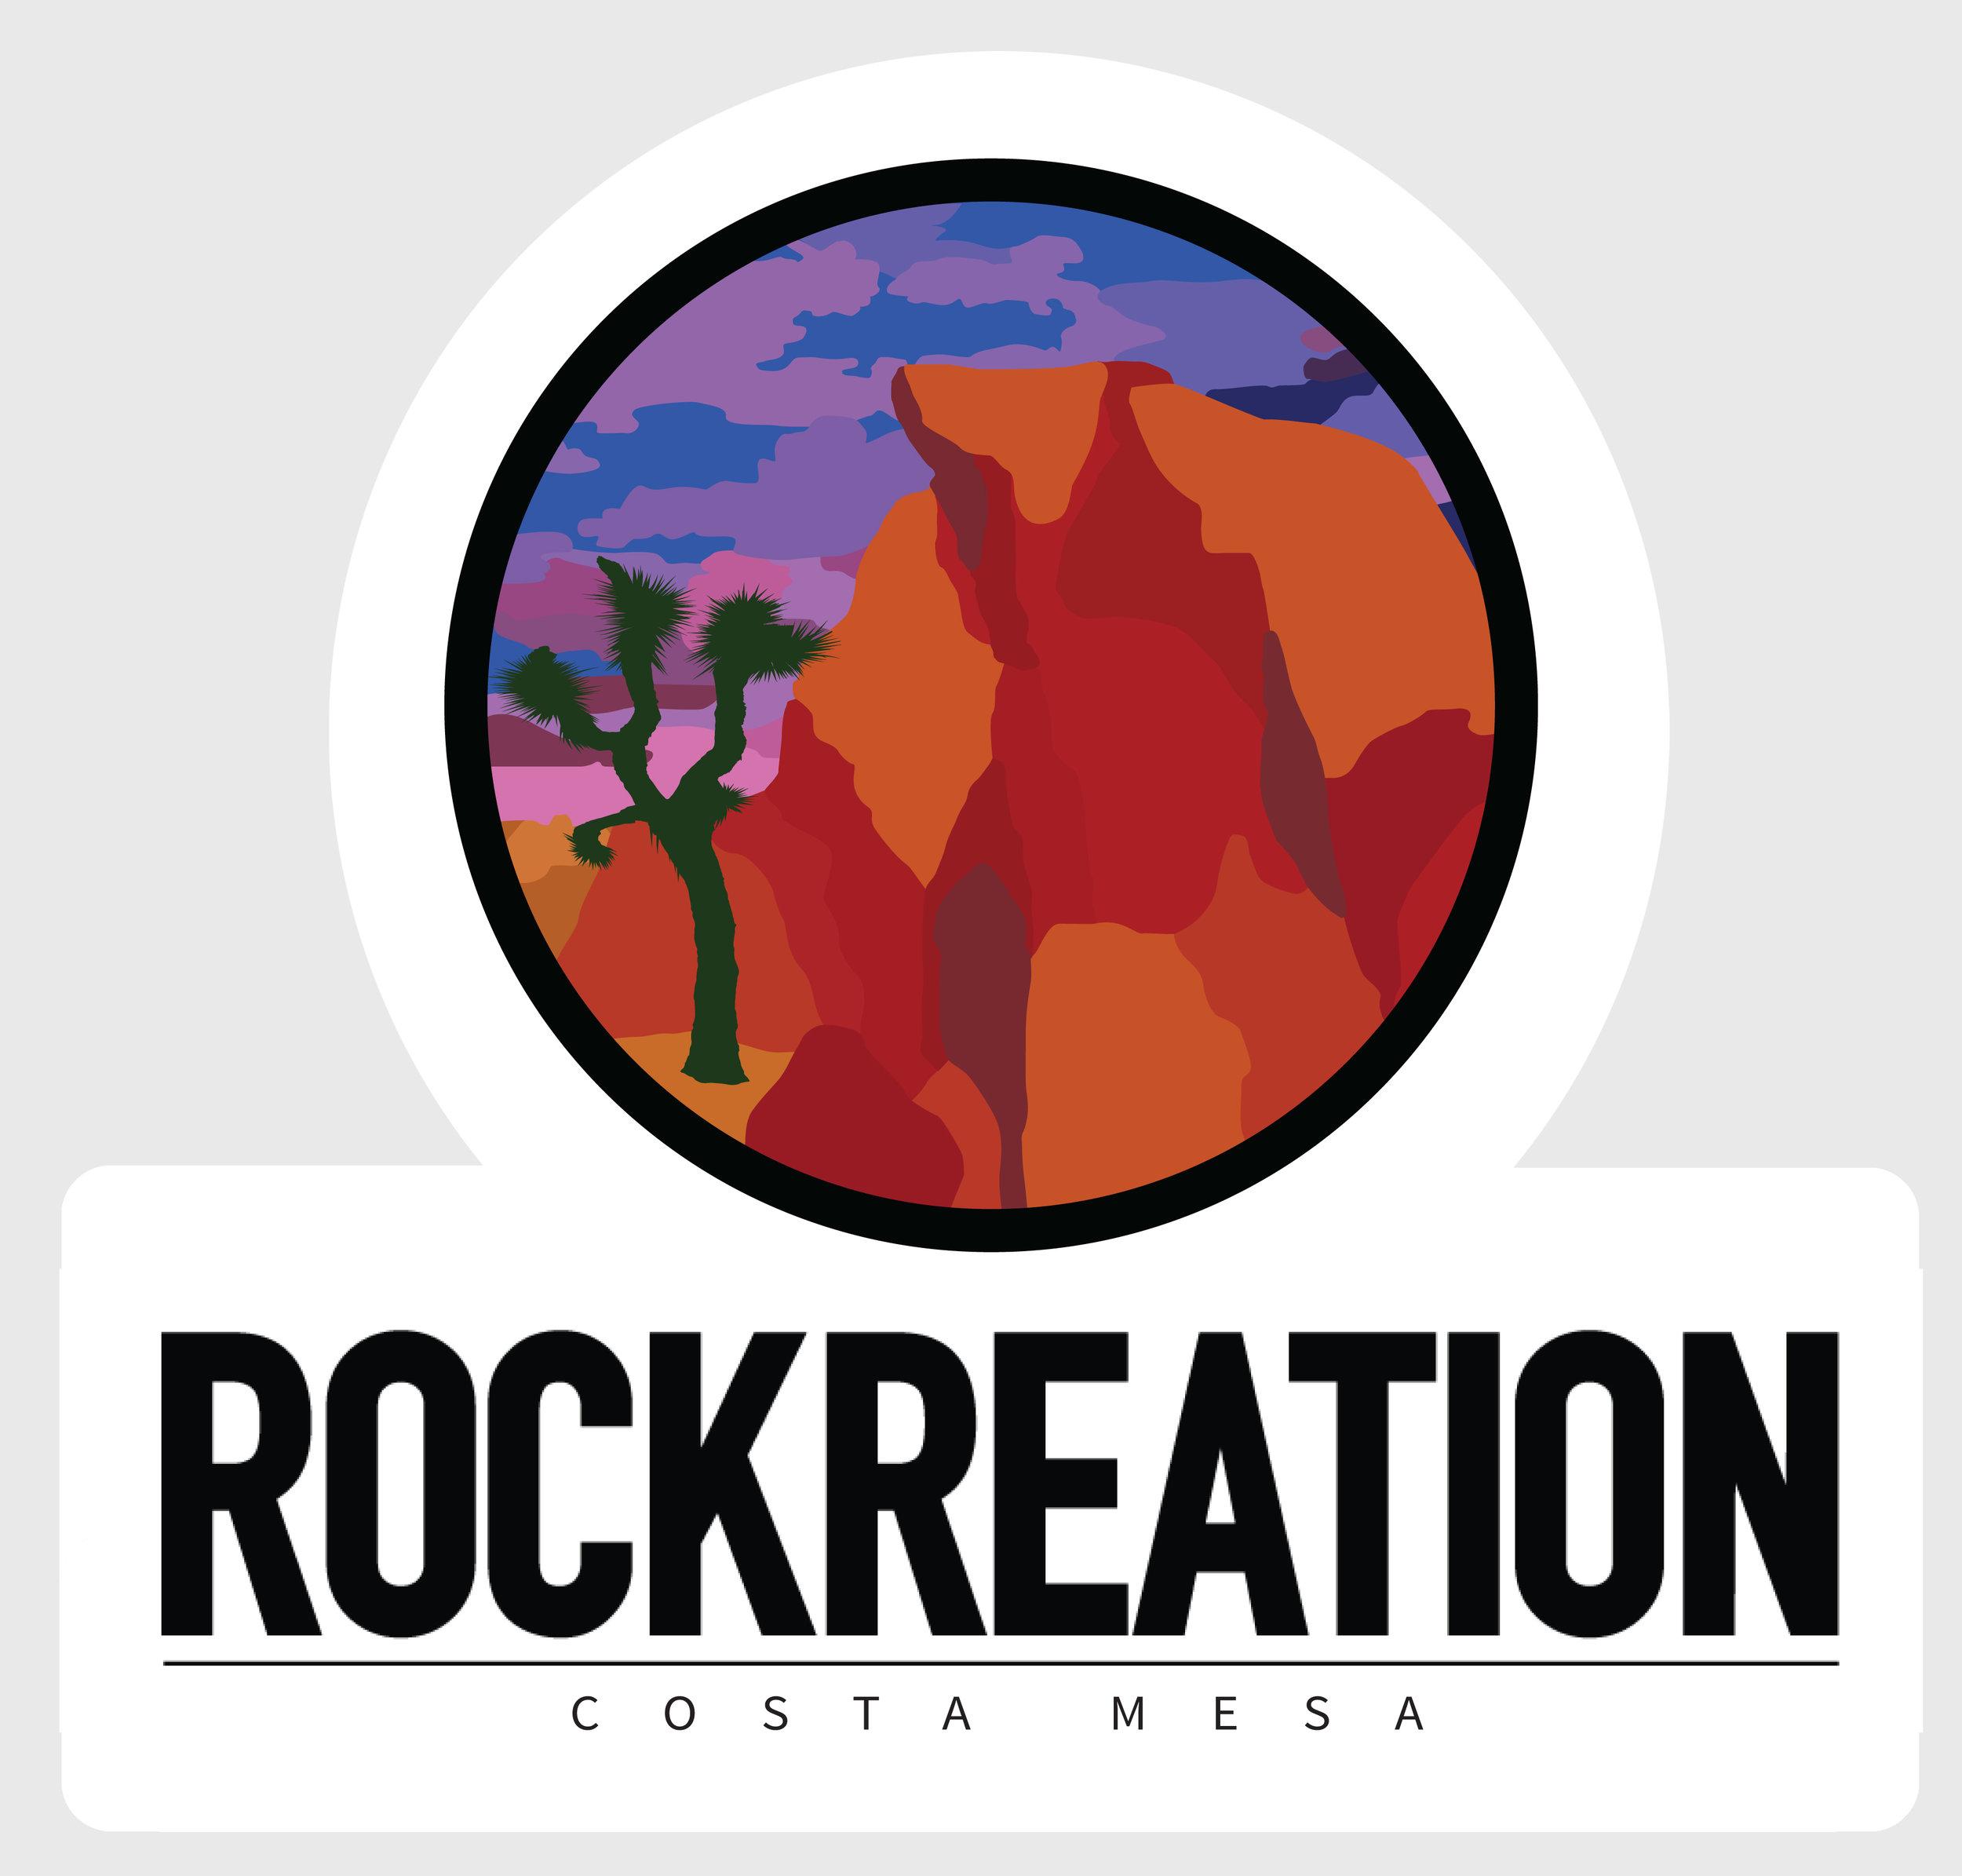 Rockreation_CM.jpg